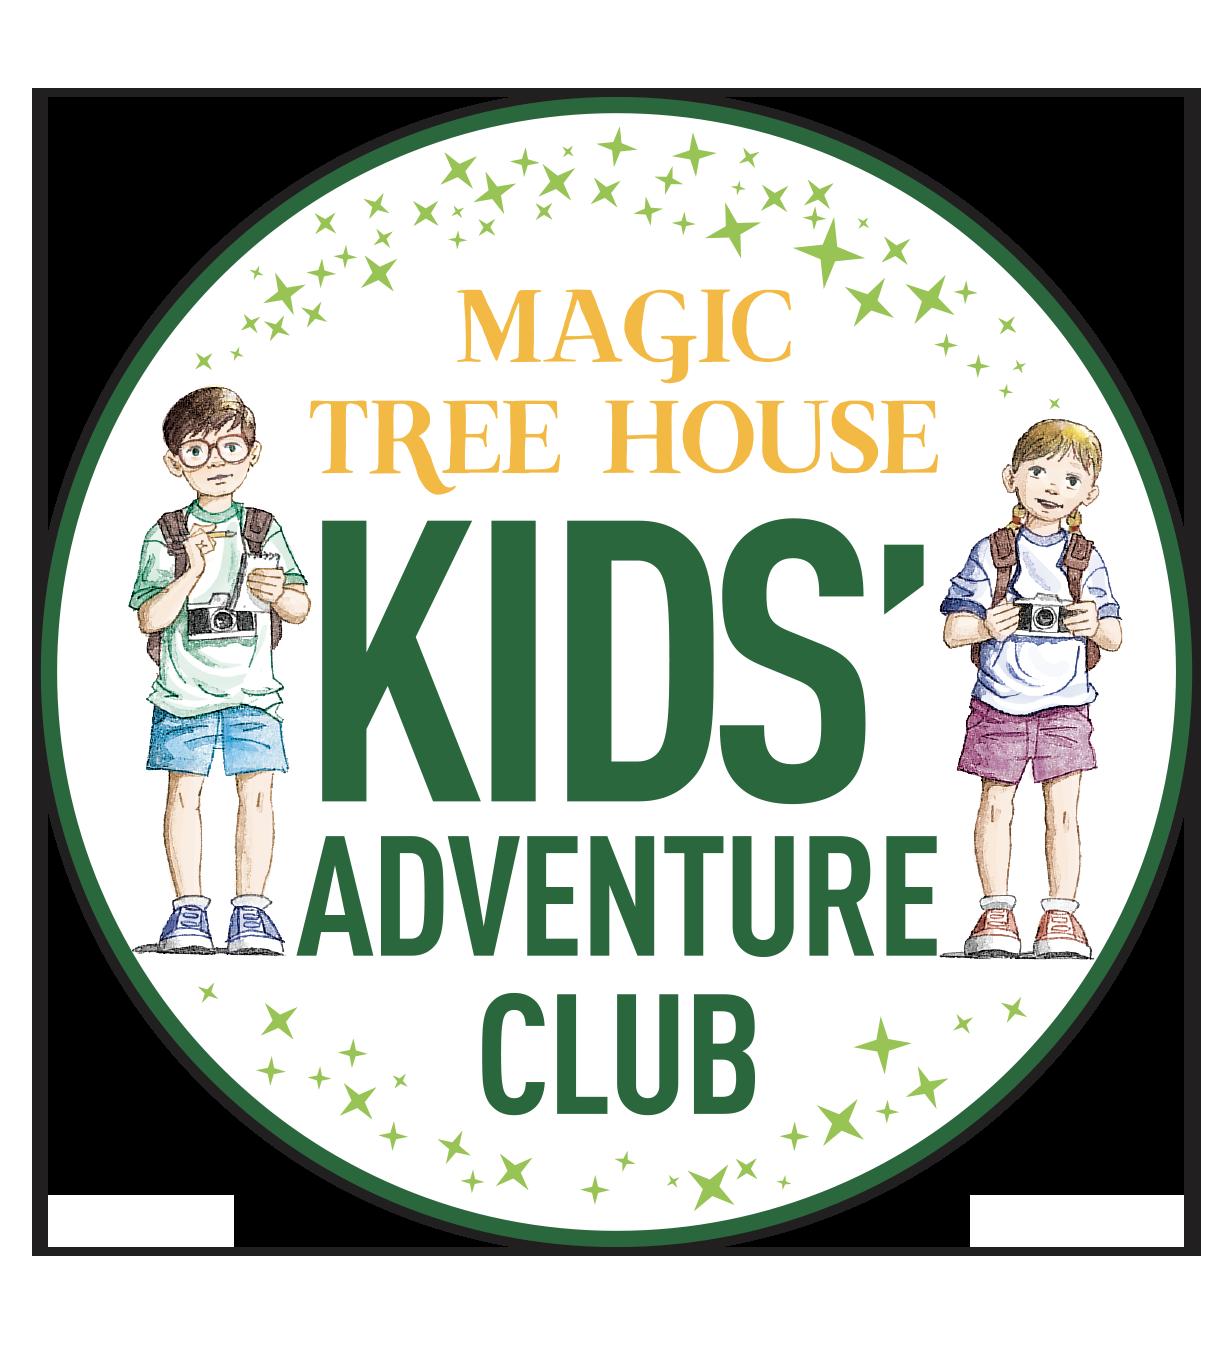 Kids Adventure Club Magic Tree House